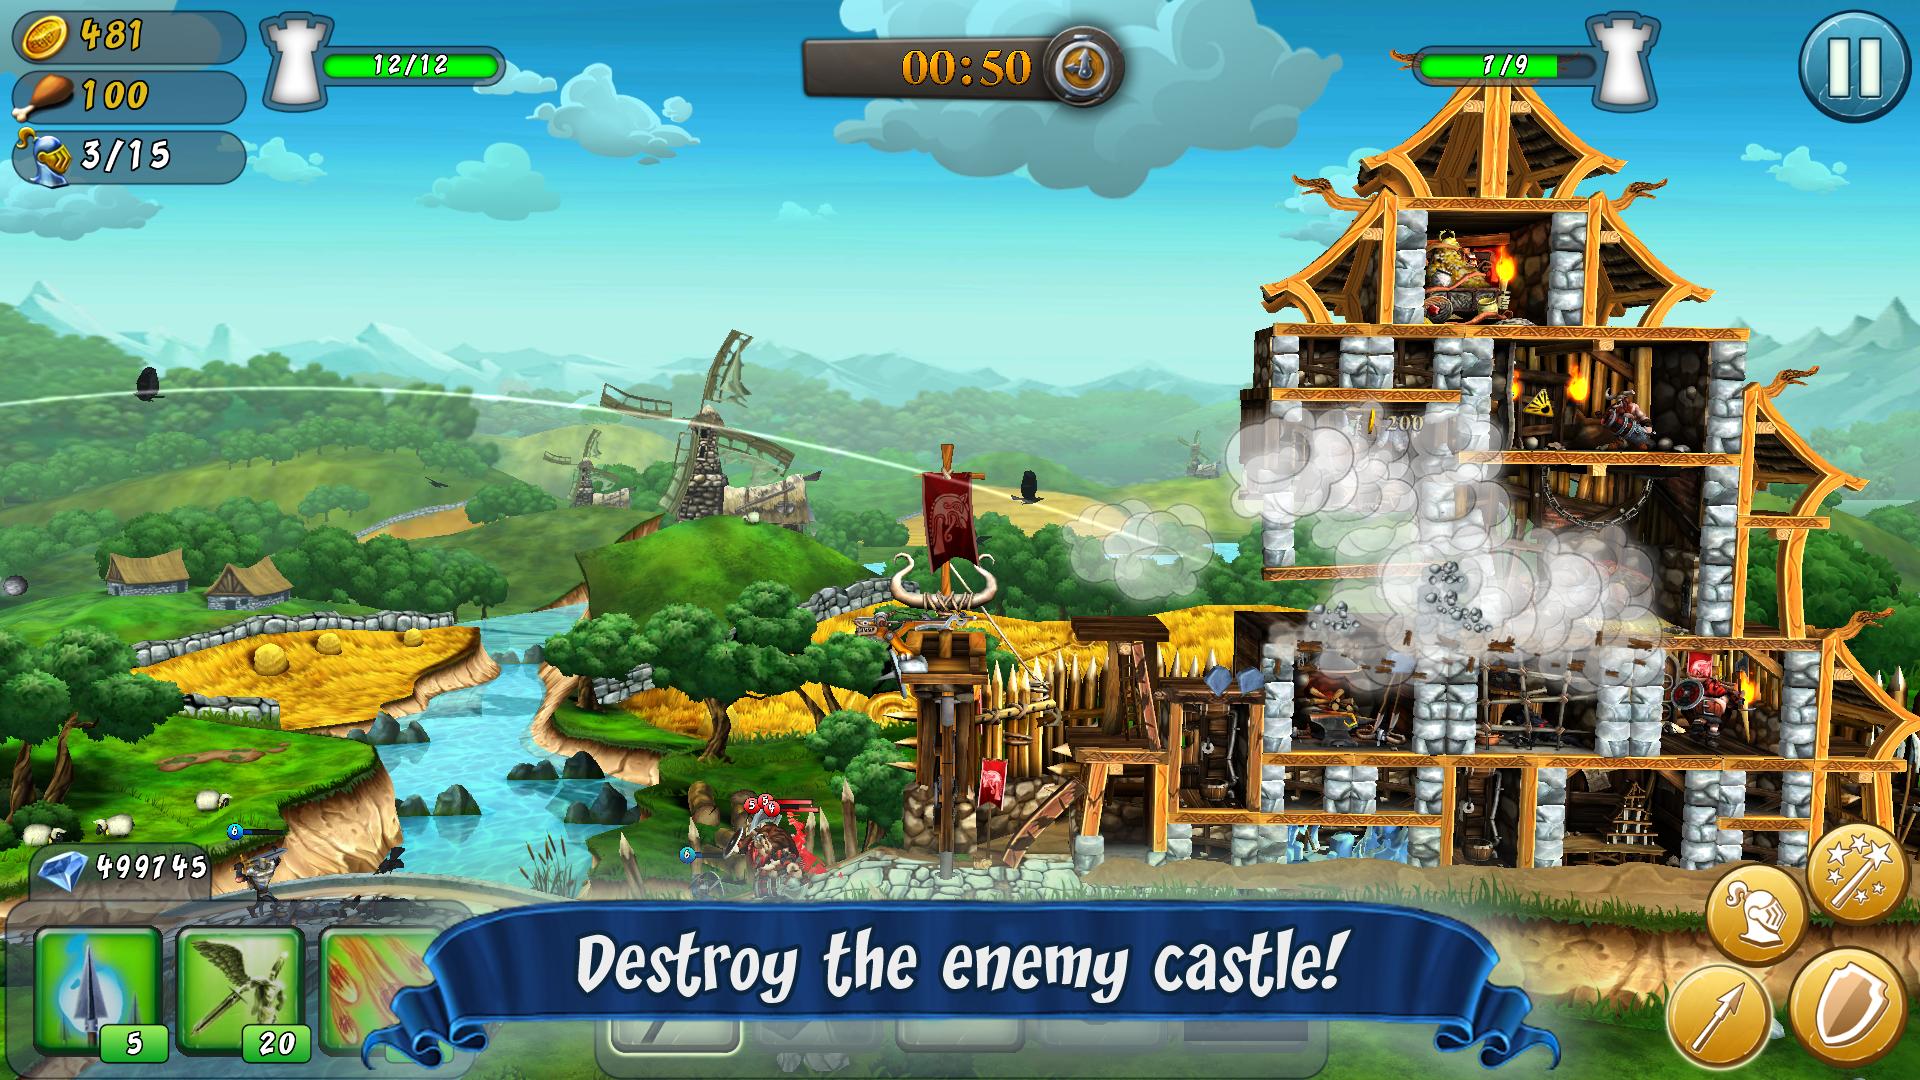 CastleStorm - Free to Siege screenshot #23